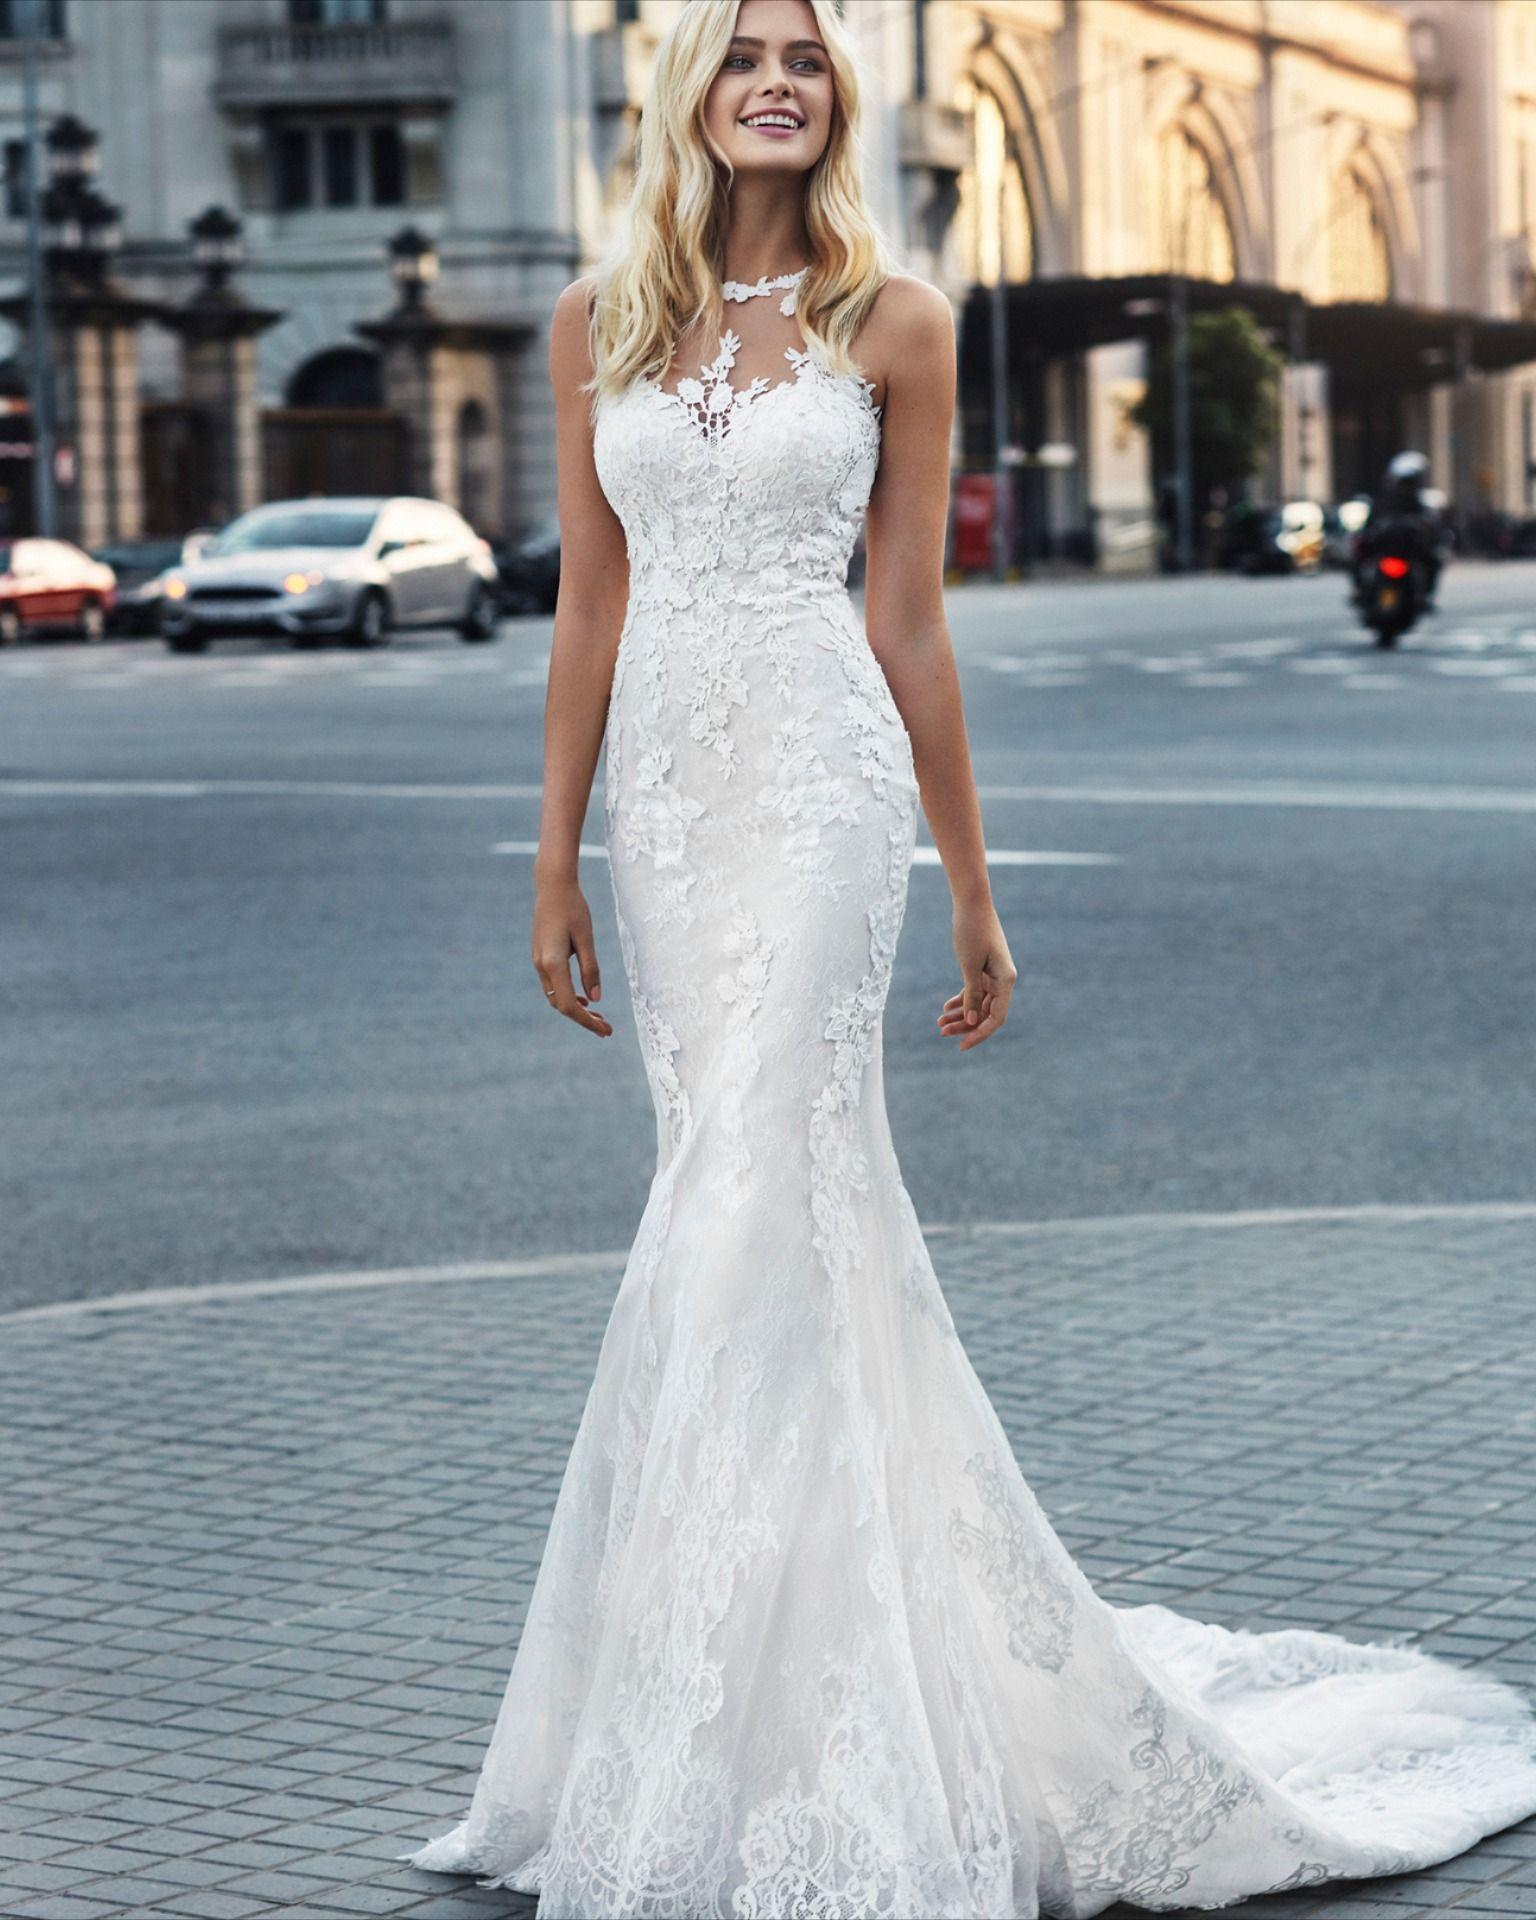 Luna Novias Varna At Unbridaled Halter Wedding Dress Lace Wedding Dresses Halter Wedding Dress [ 1920 x 1536 Pixel ]